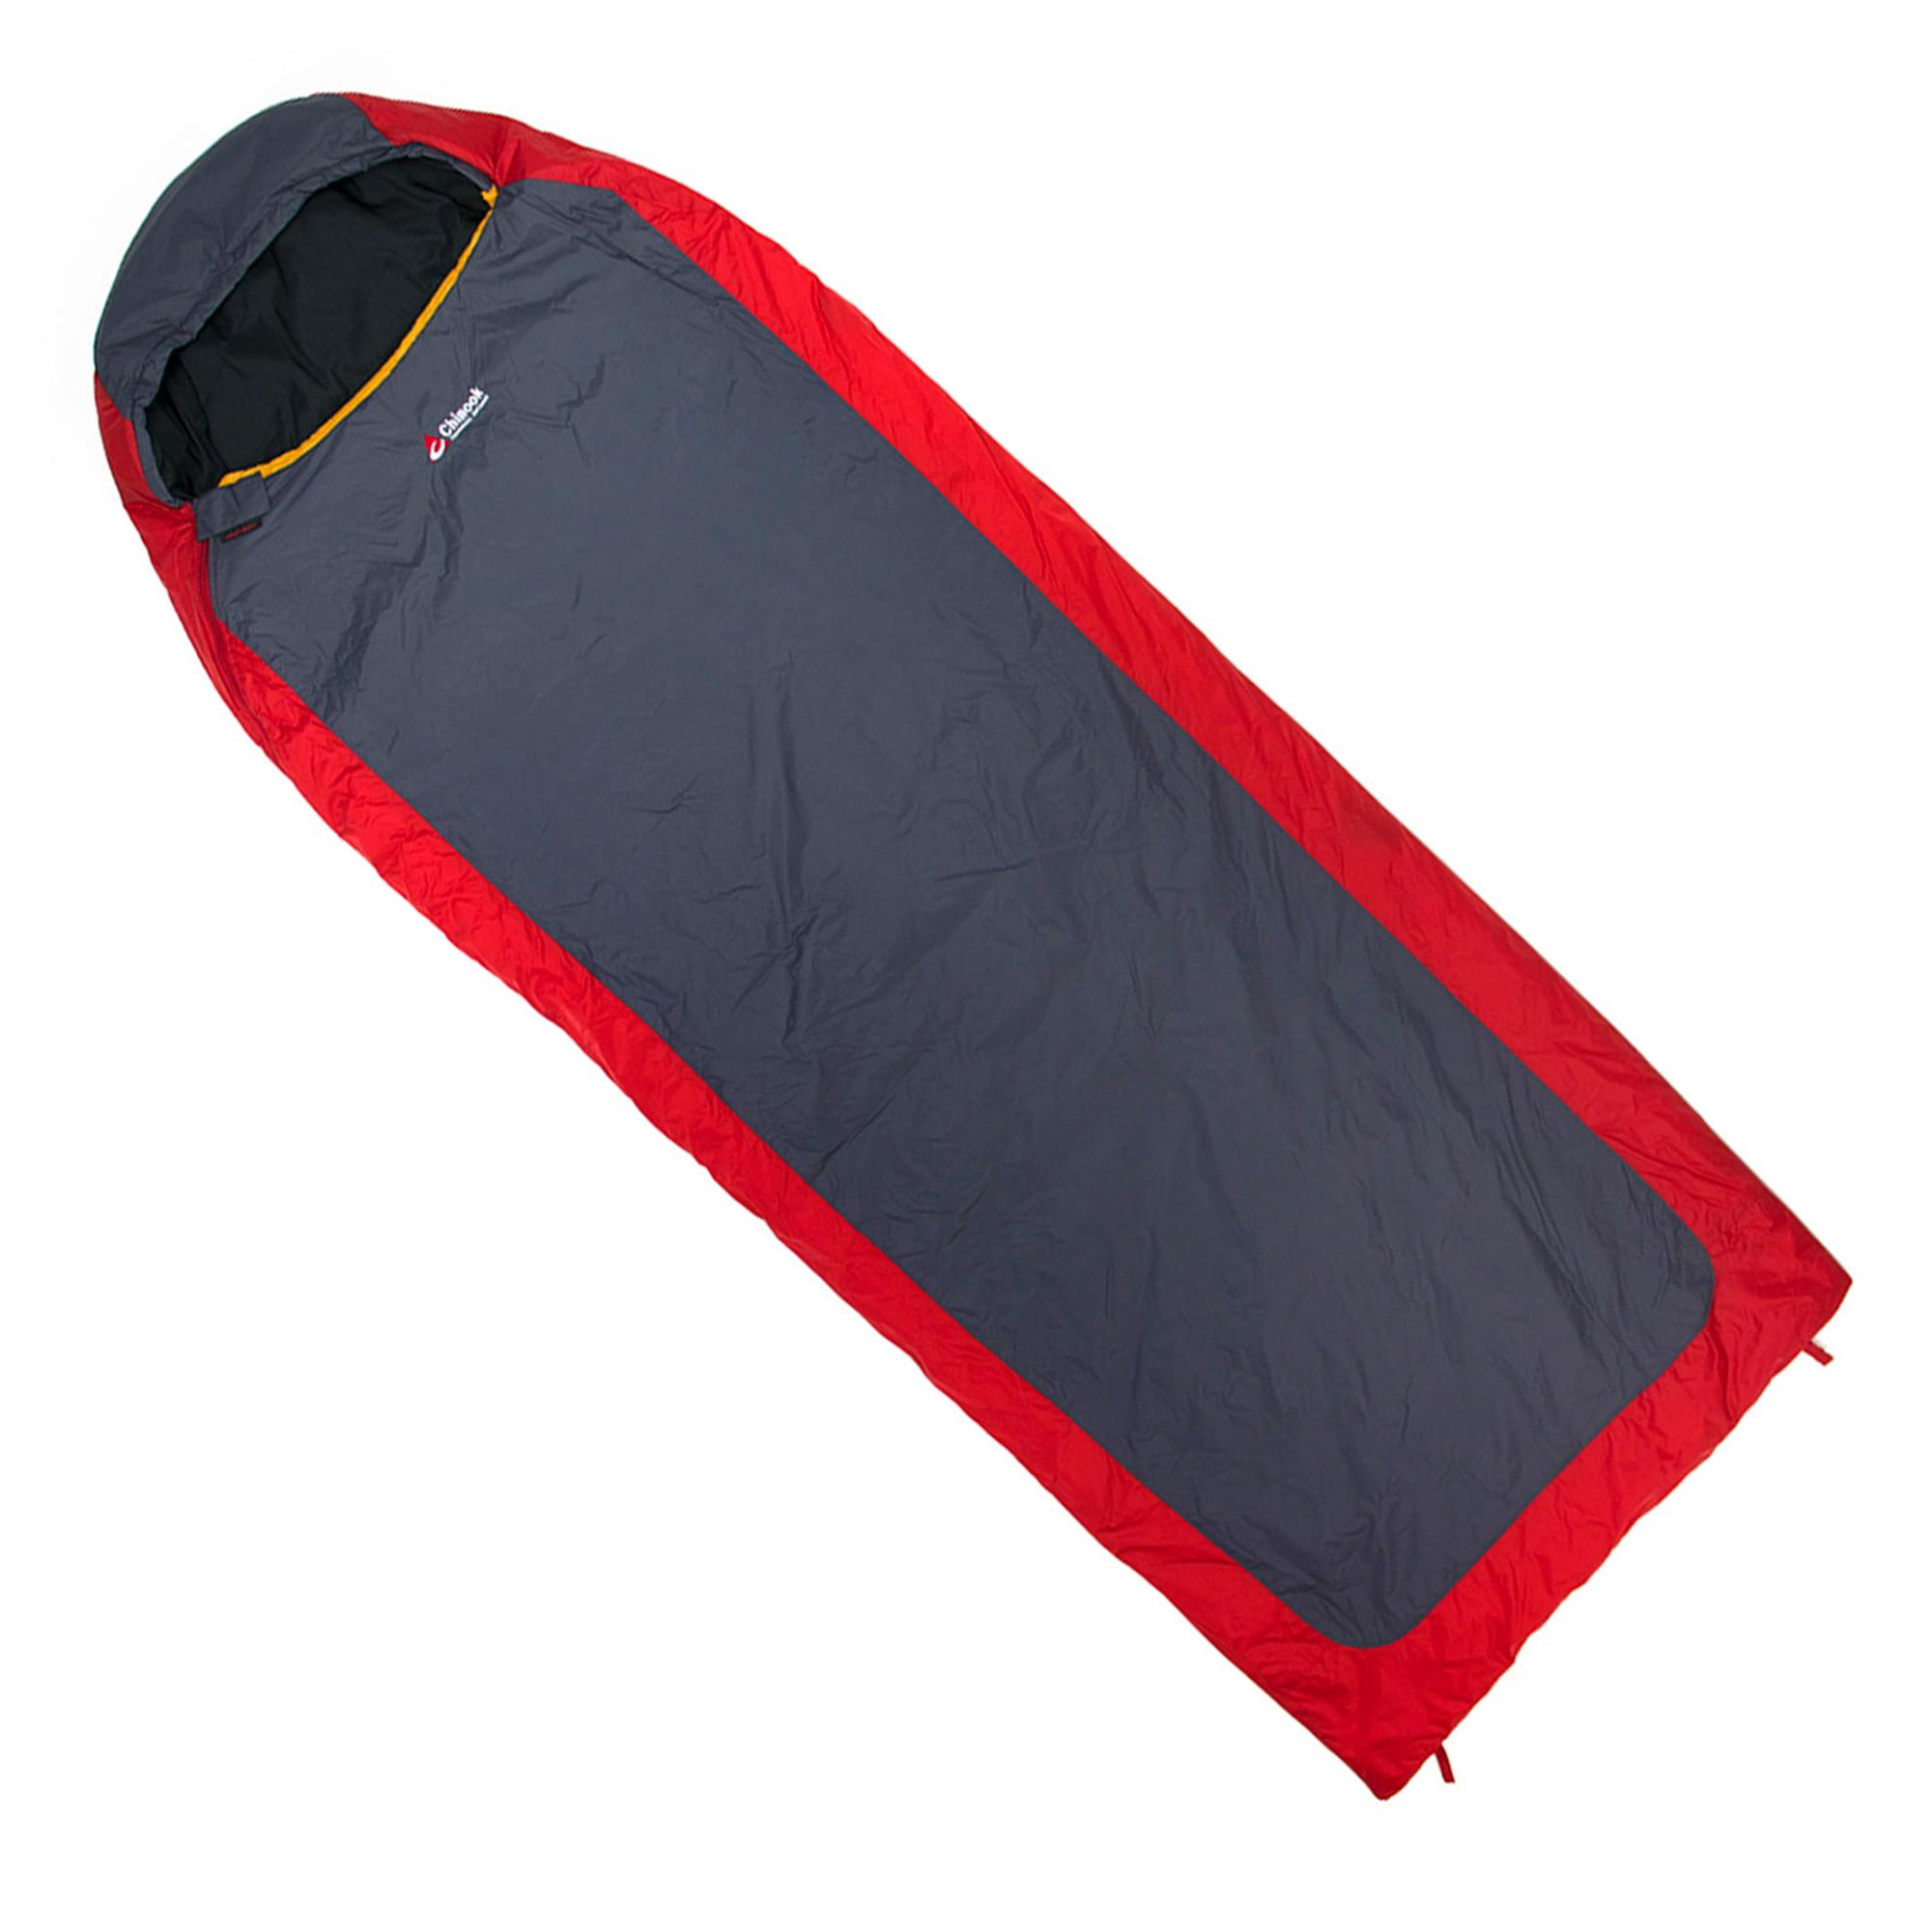 Chinook Mummy Sleeping Bag Everest Micro II 32° F, Red/Gray